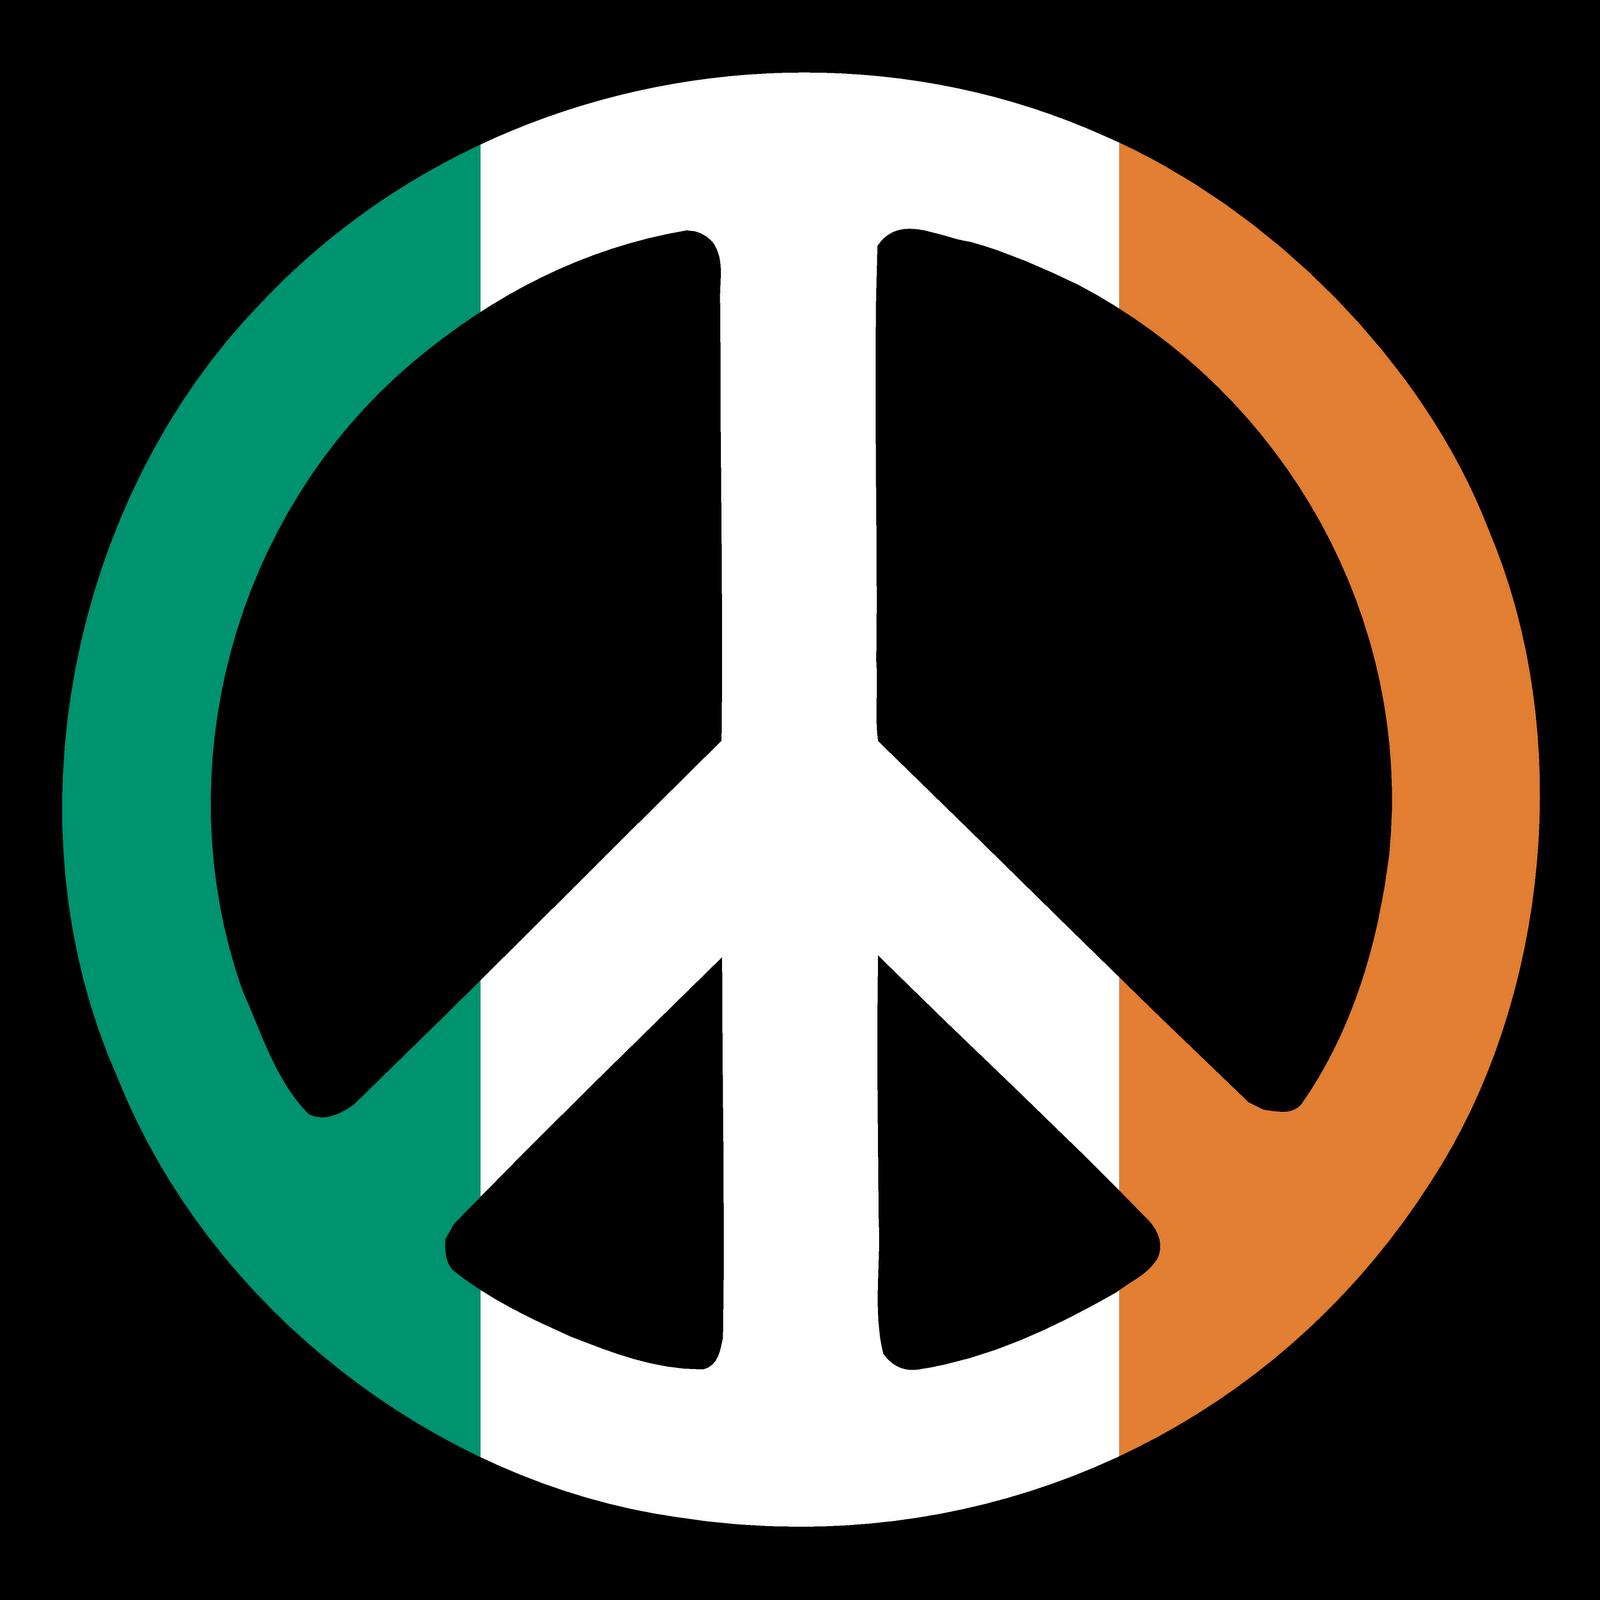 Freedom clipart. Symbol